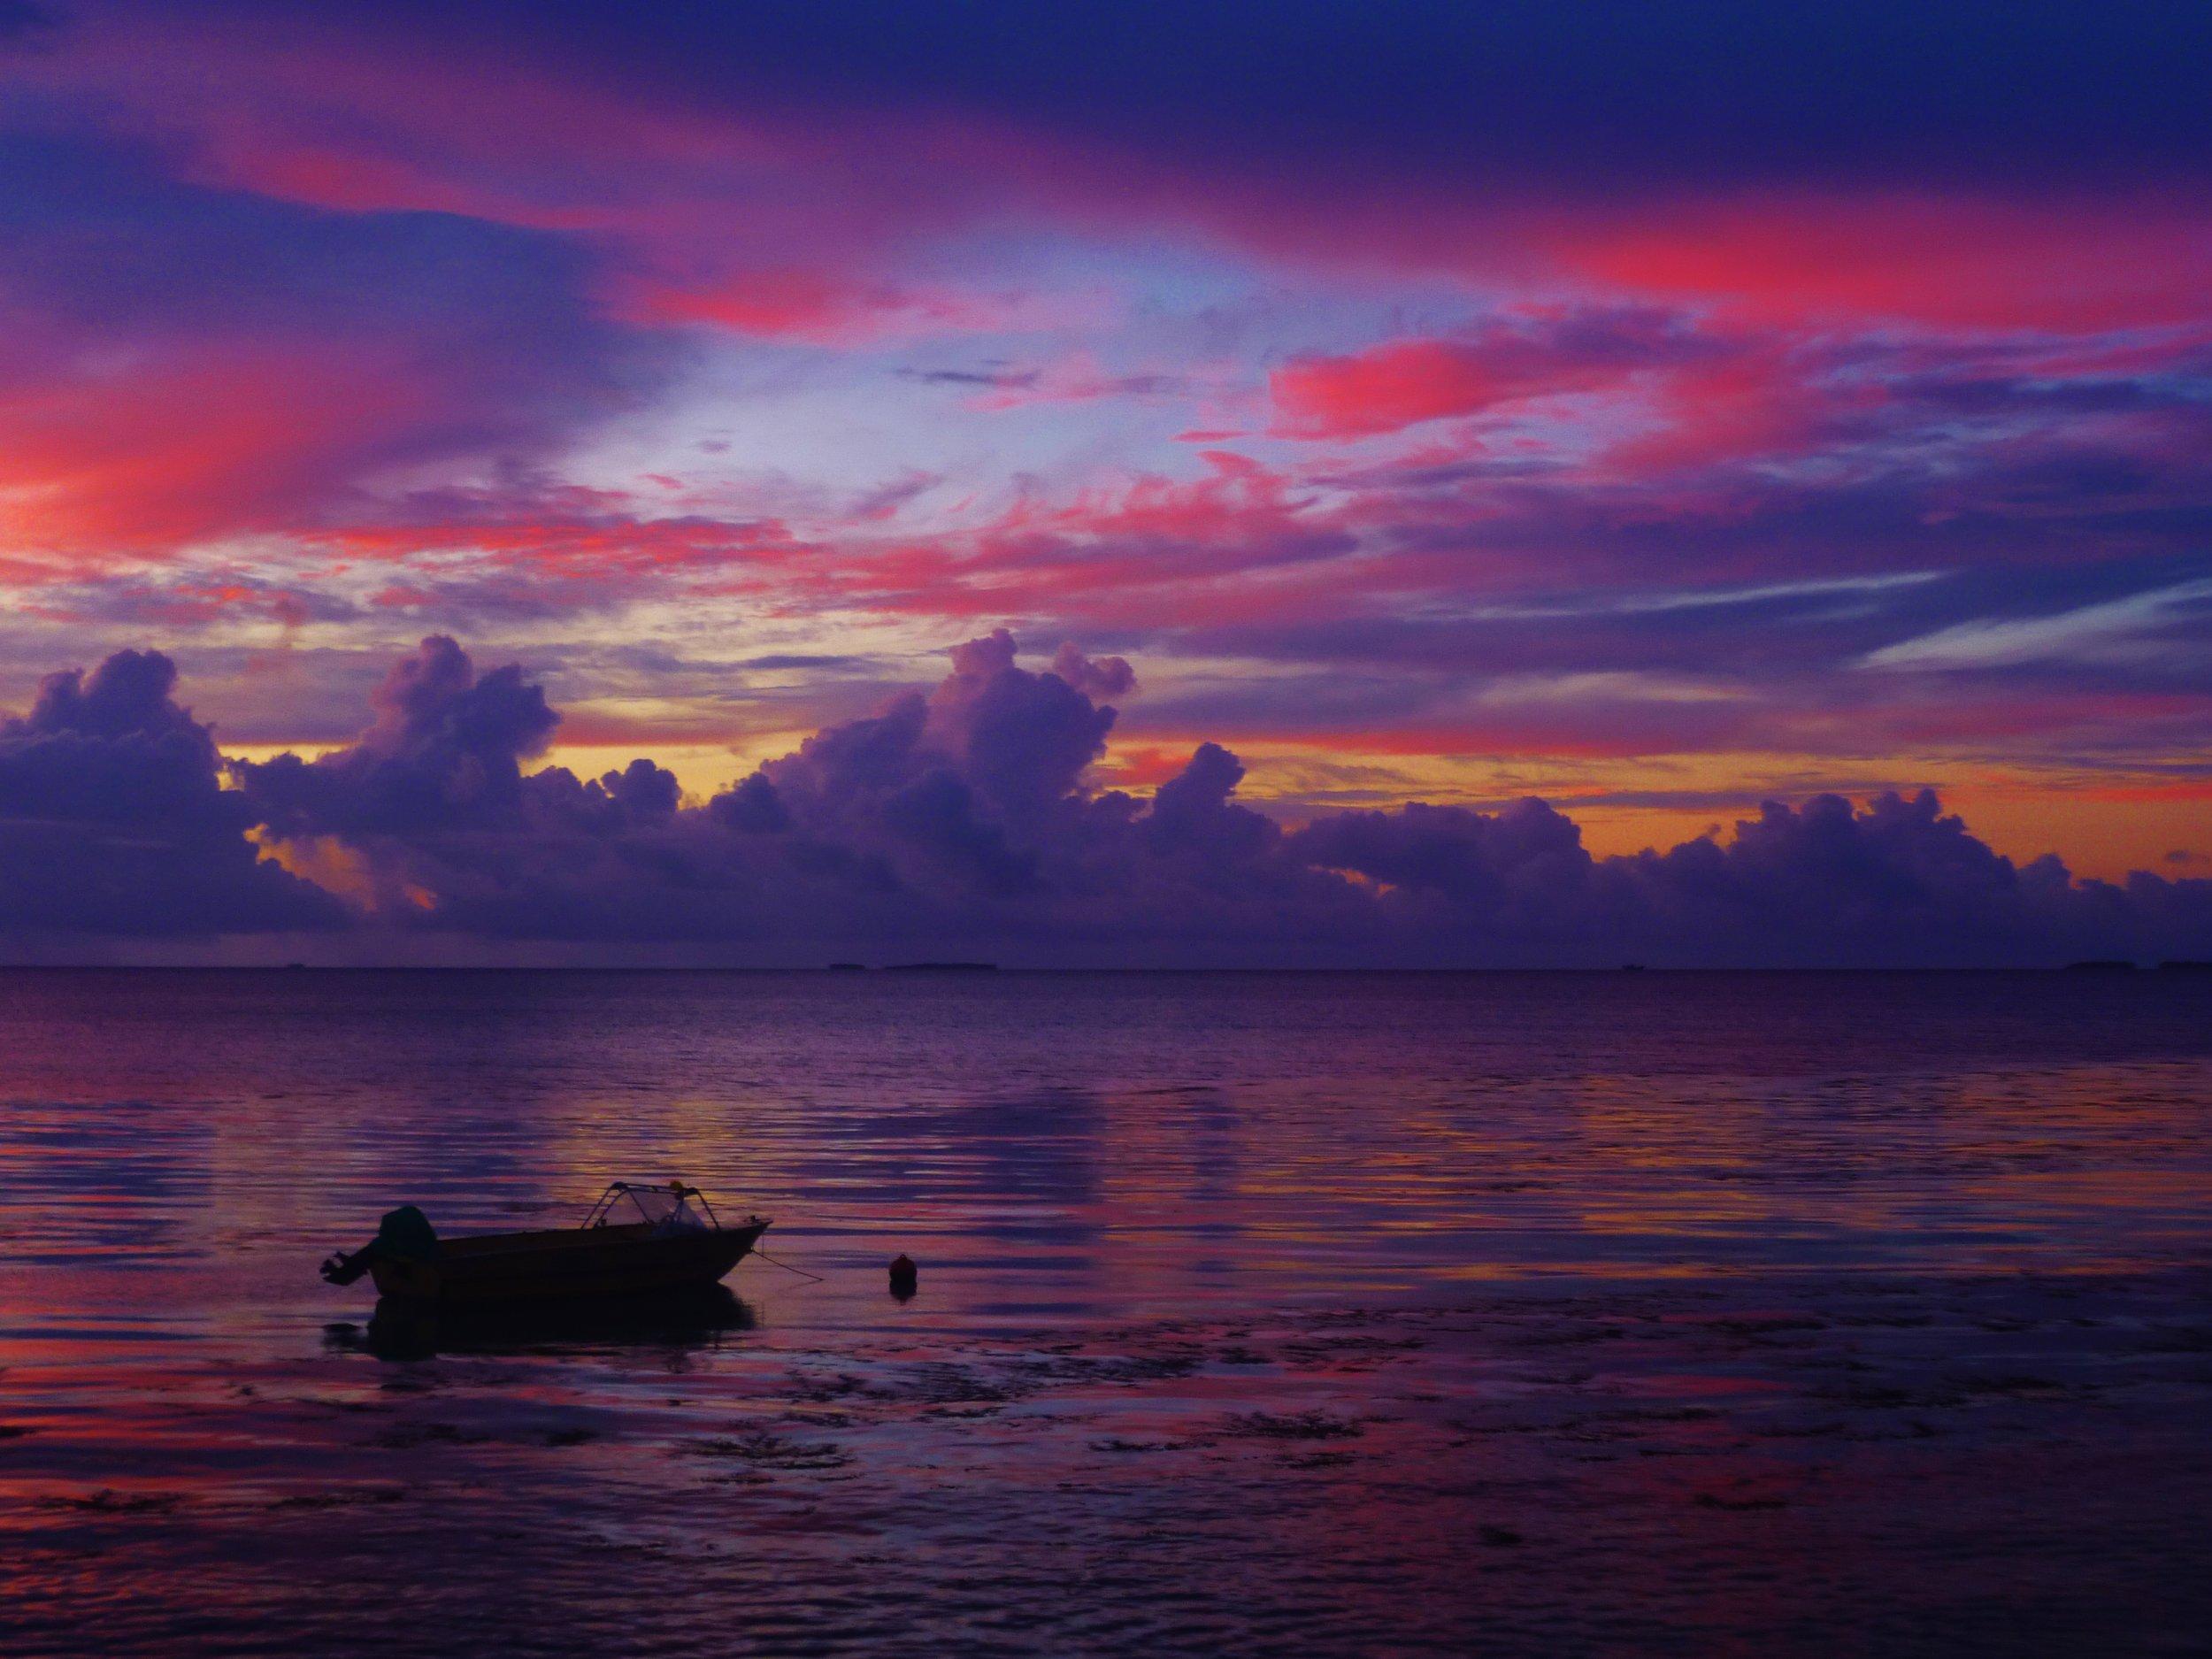 andyexplores.wordpress.com - Sunset in Funafuti.JPG